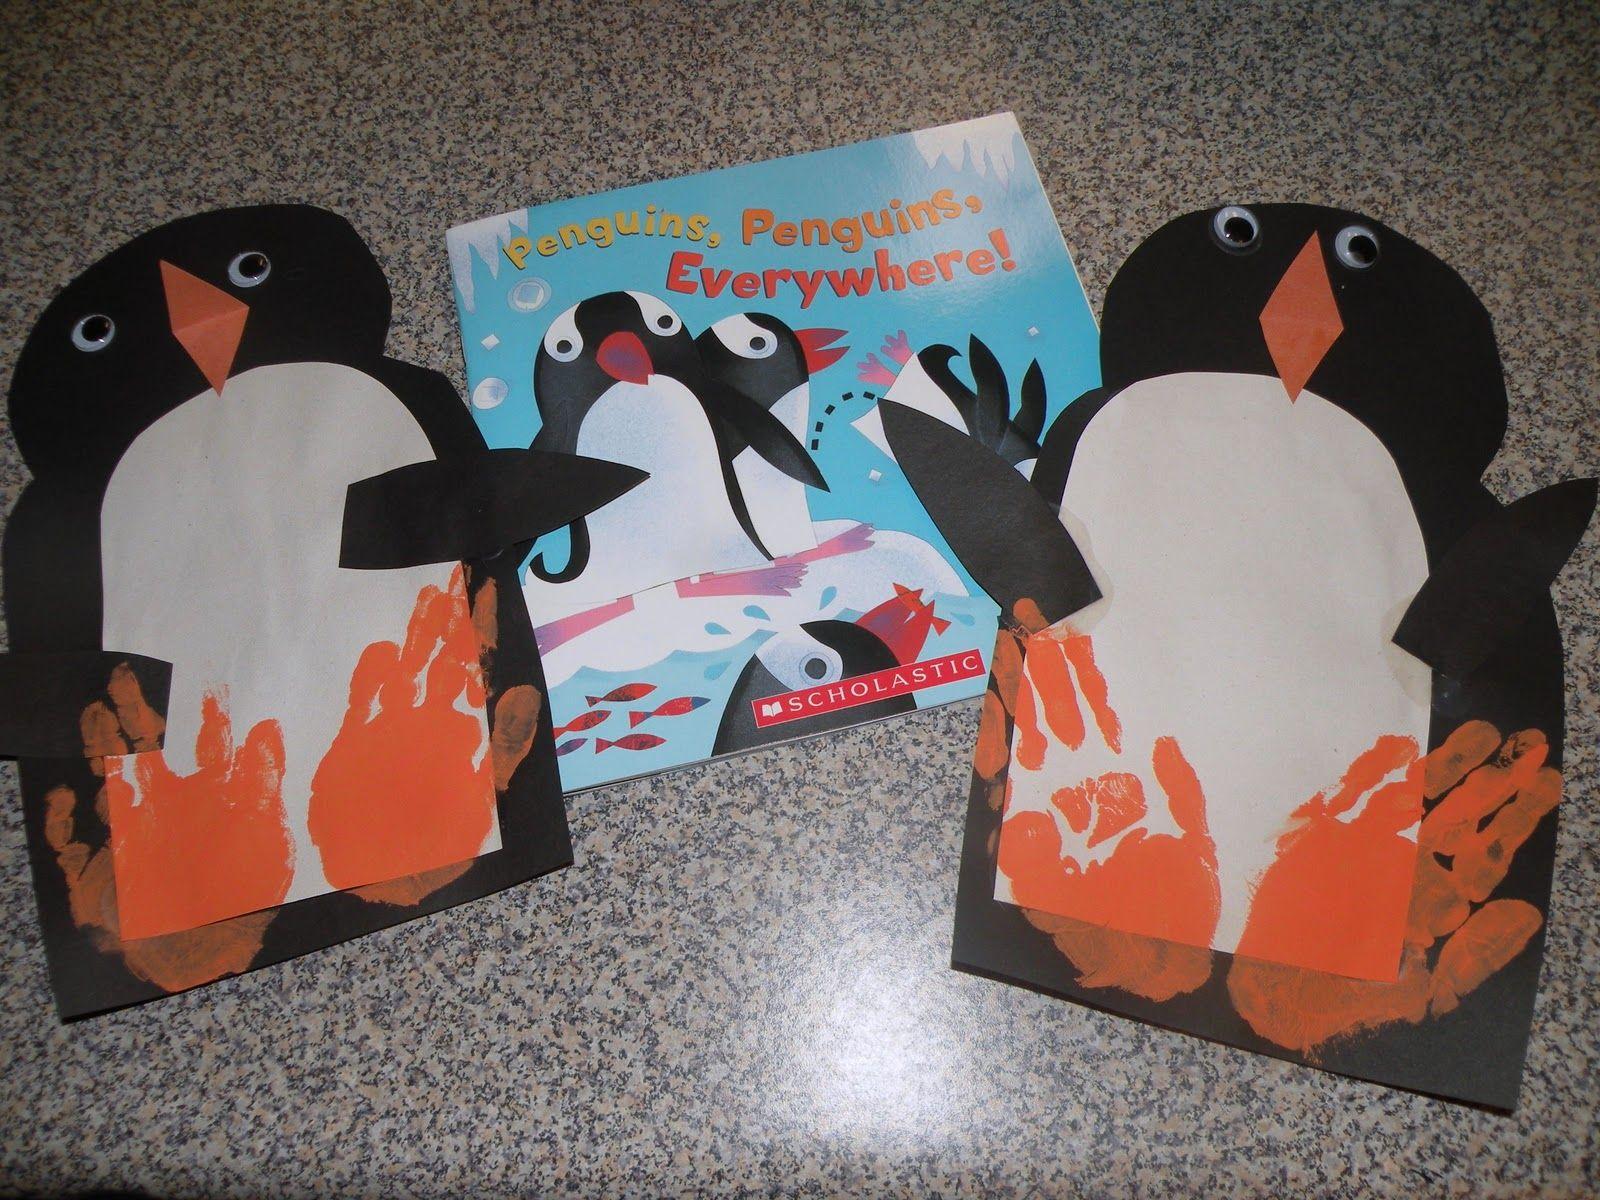 Casa Camacho Book Project Penguins Penguins Everywhere